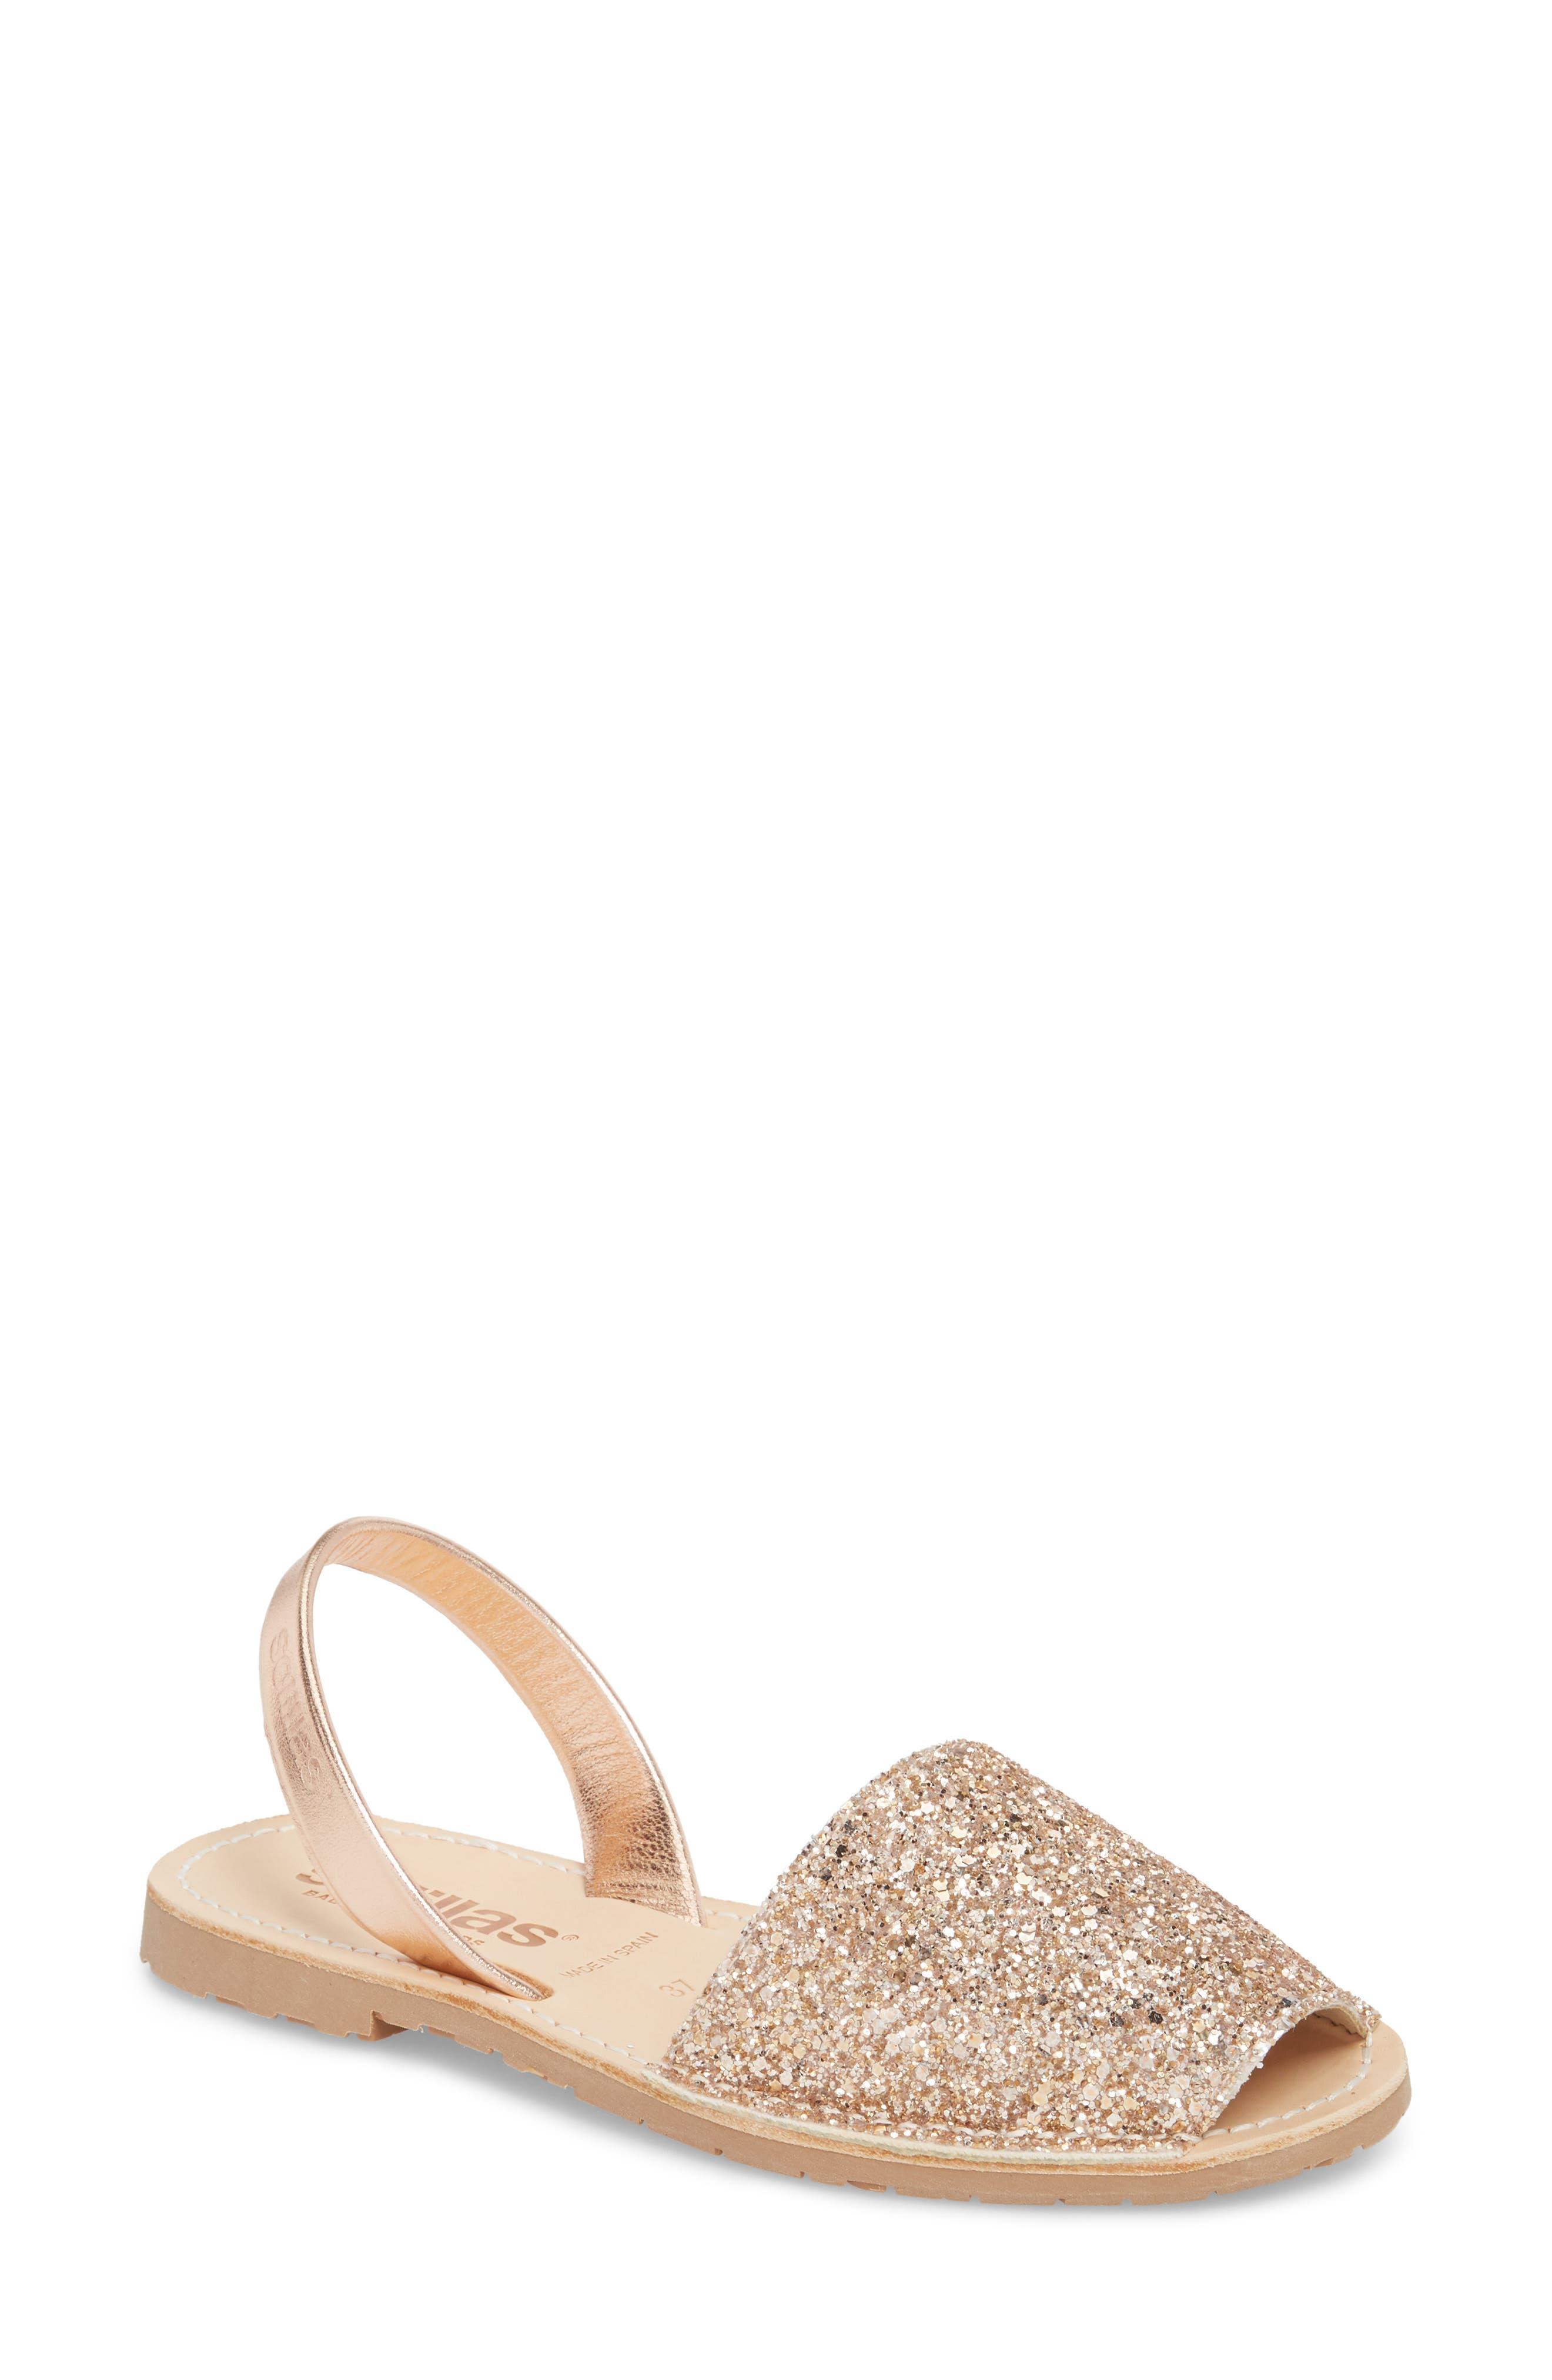 SOLILLAS Flat Sandal, Main, color, 698